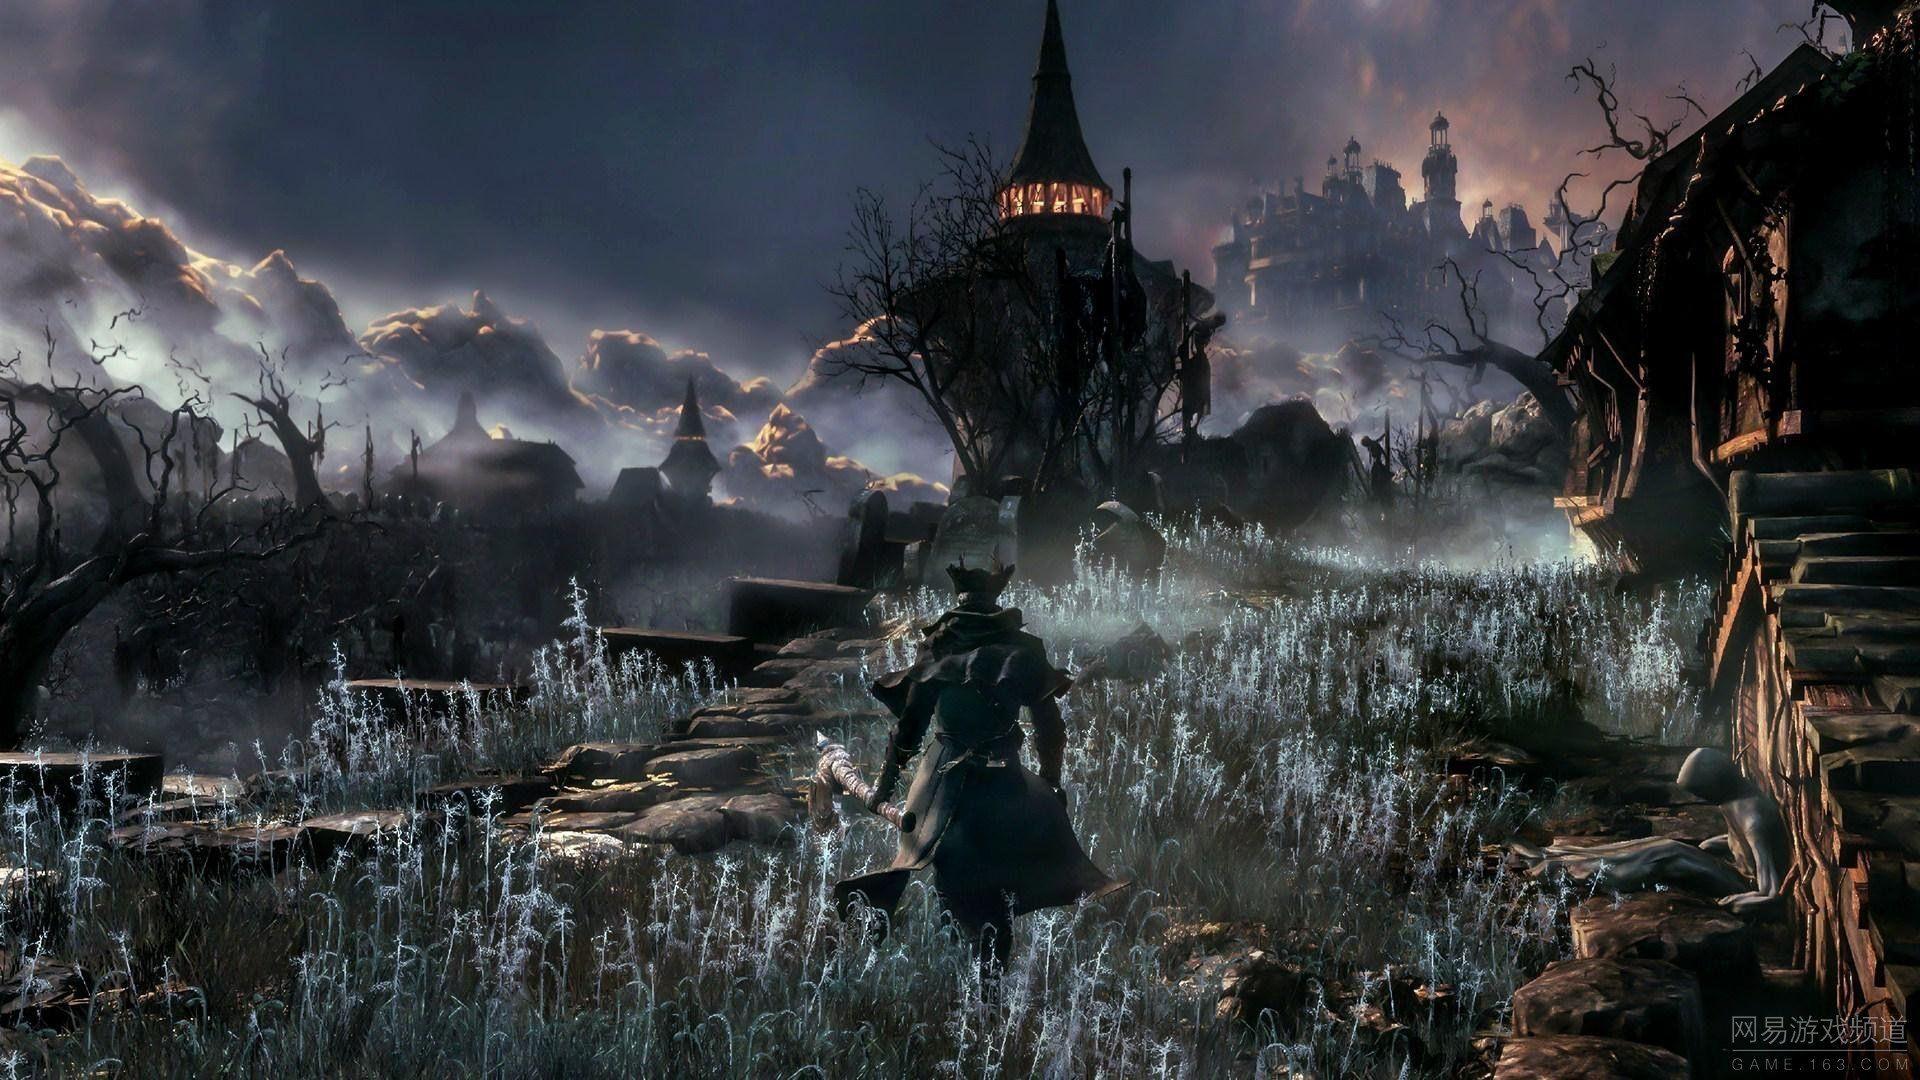 Dark Souls 3 Live Wallpaper Best Wallpaper HD Dark